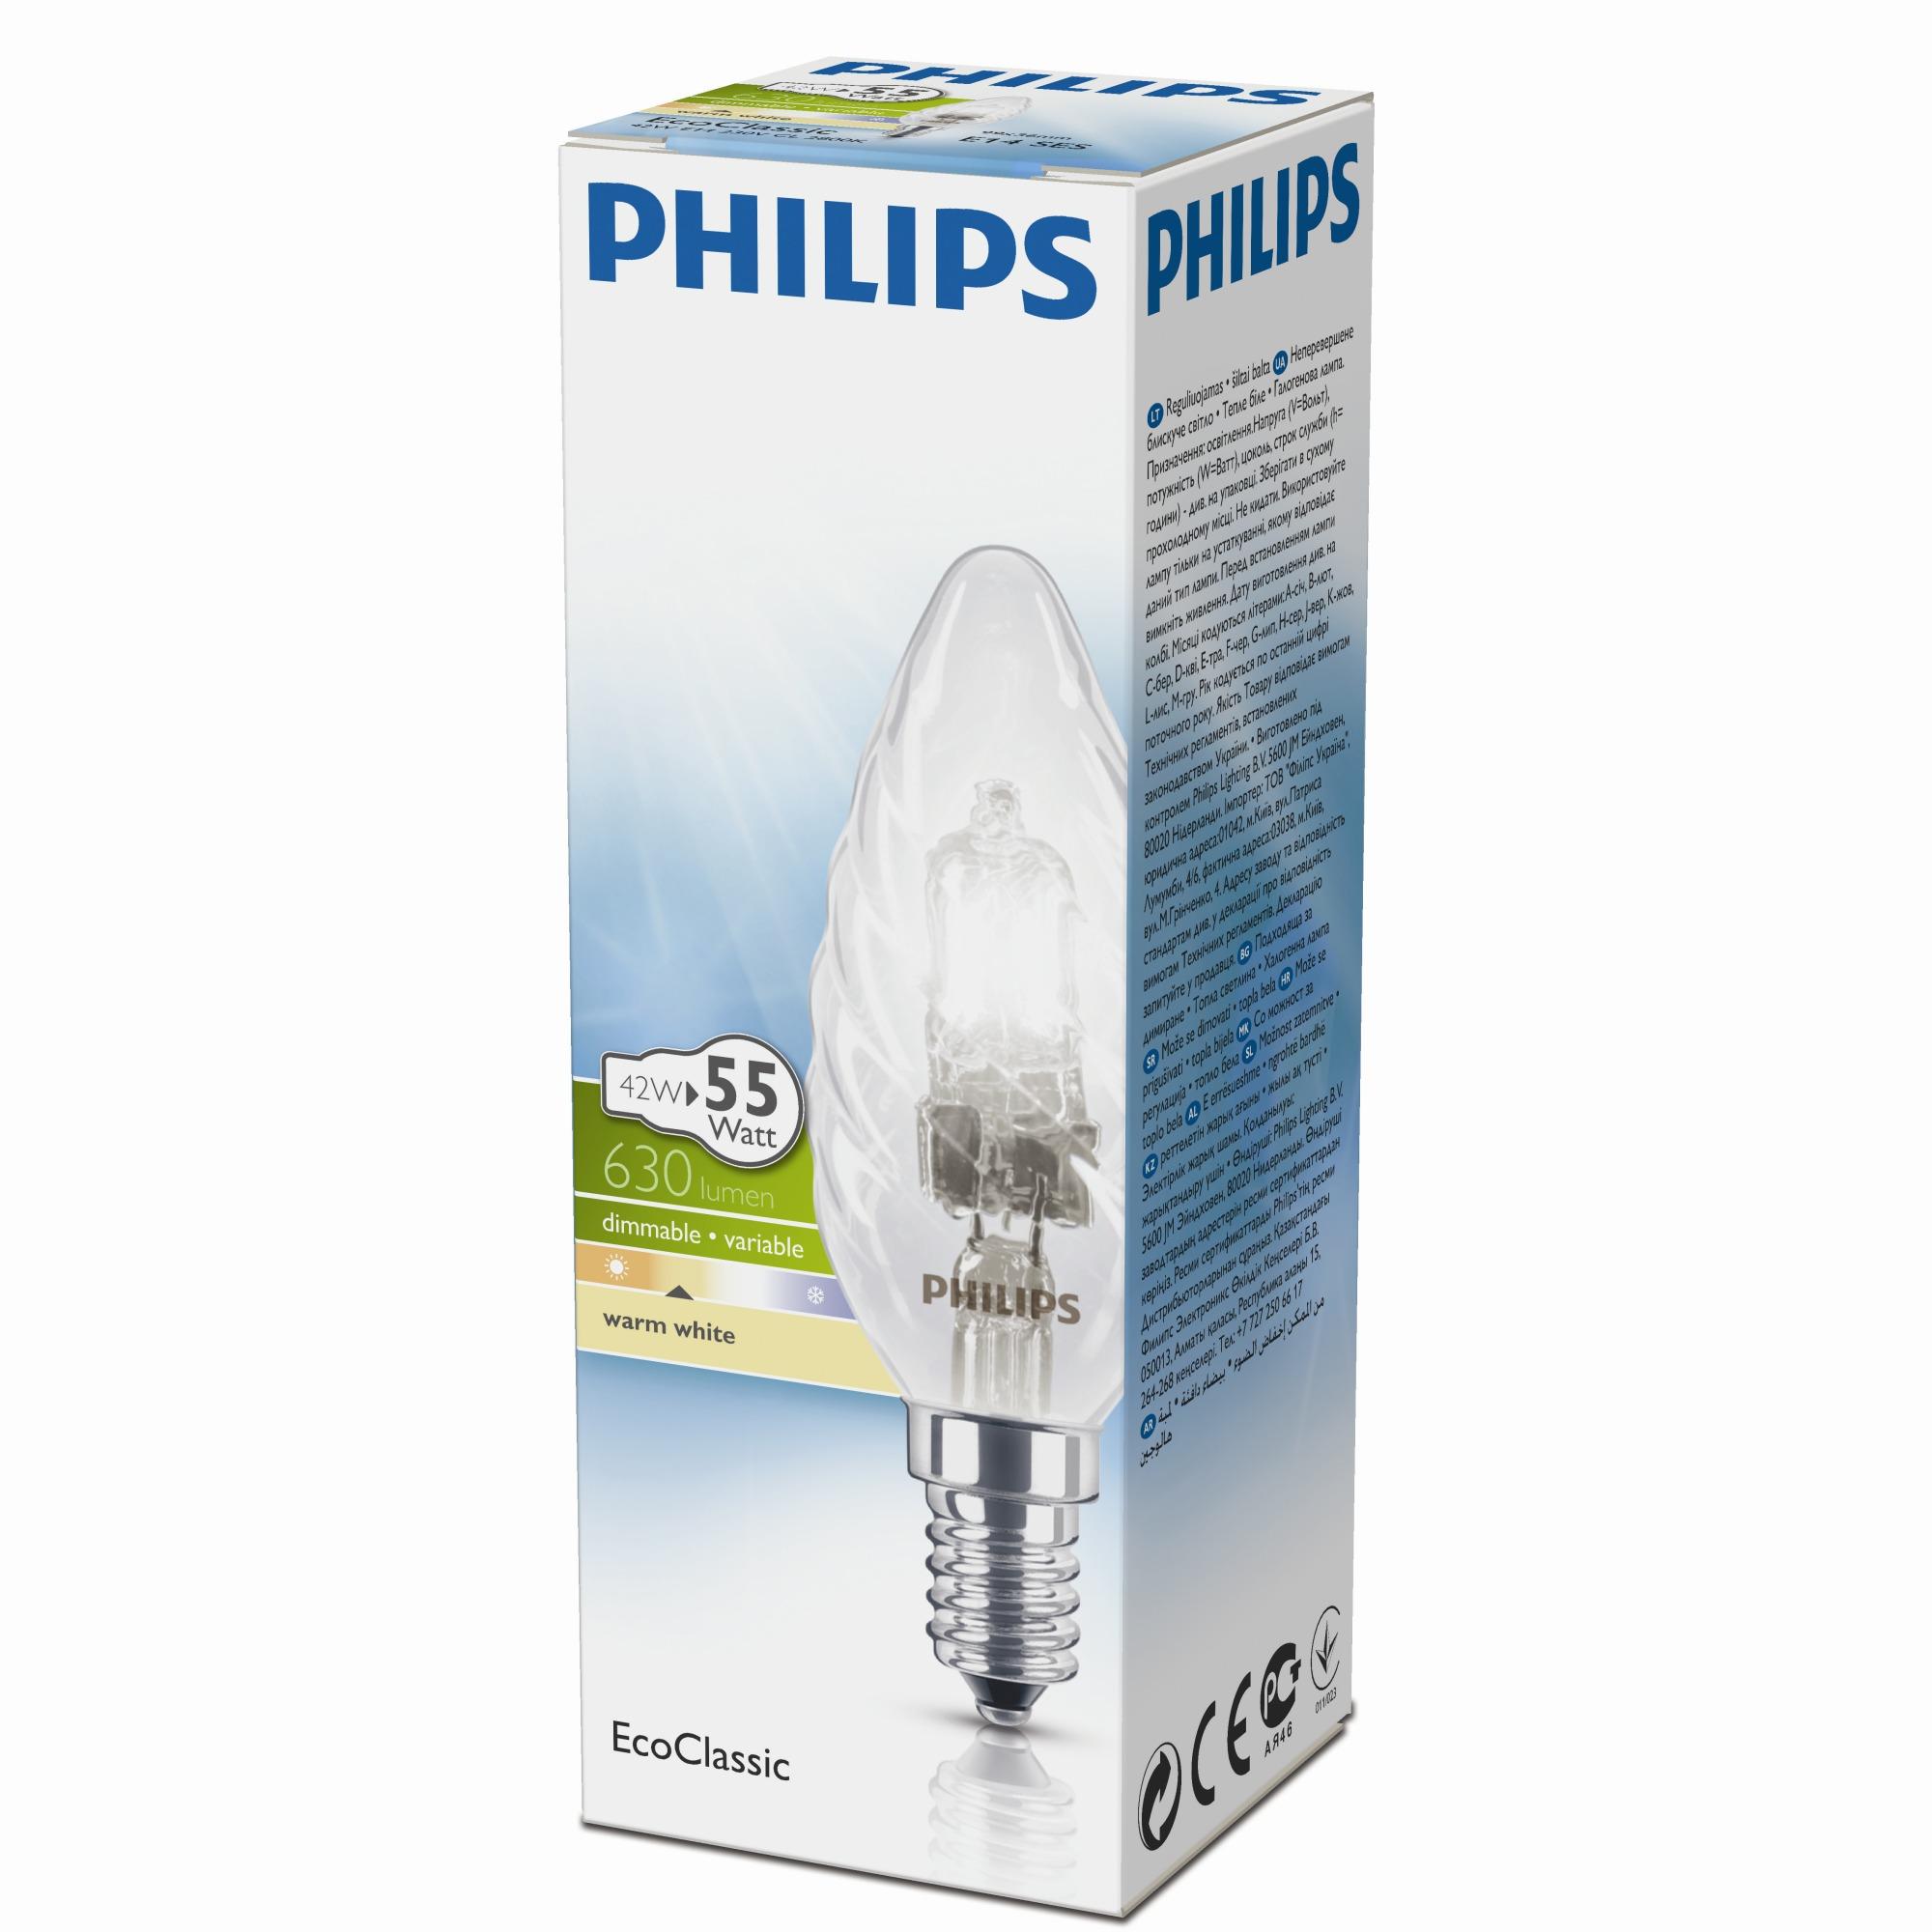 Ph Hoogvolt Halogeenlamp Z Refl Ecoclassic, 36Mm, 42W, Lampsp 230V